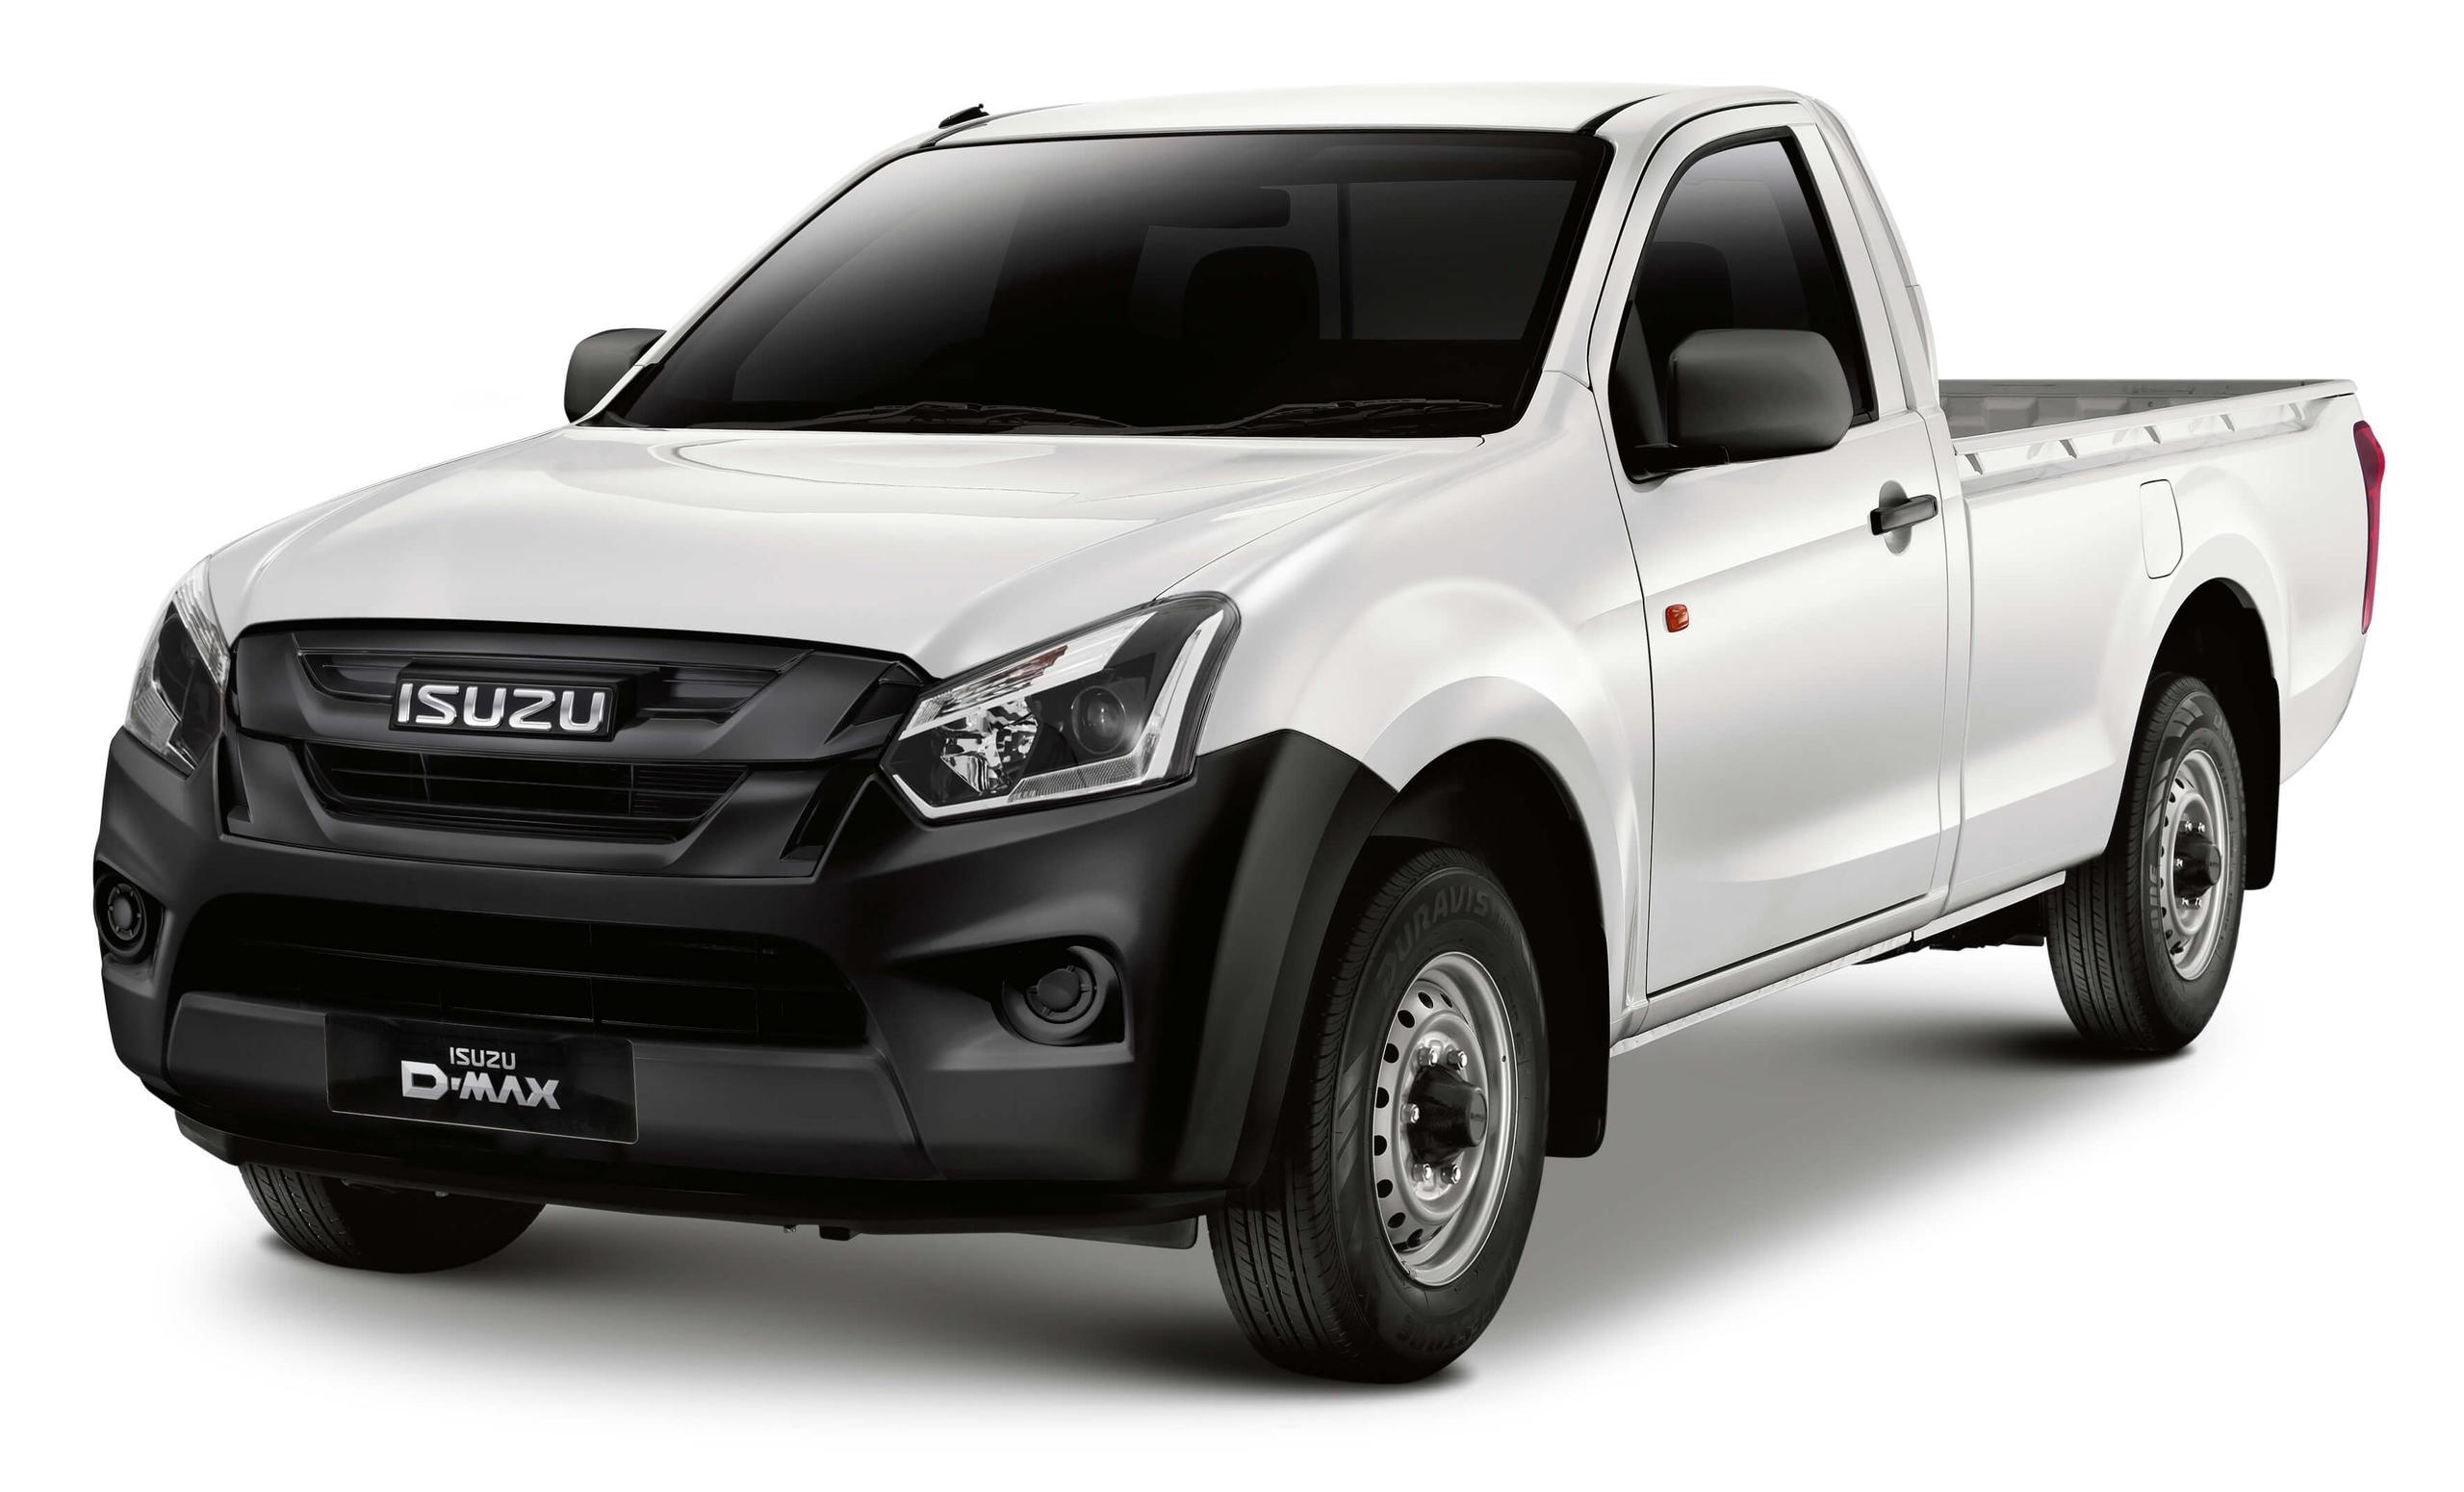 New Isuzu D-Max Utility Double Cab at Sherwoods